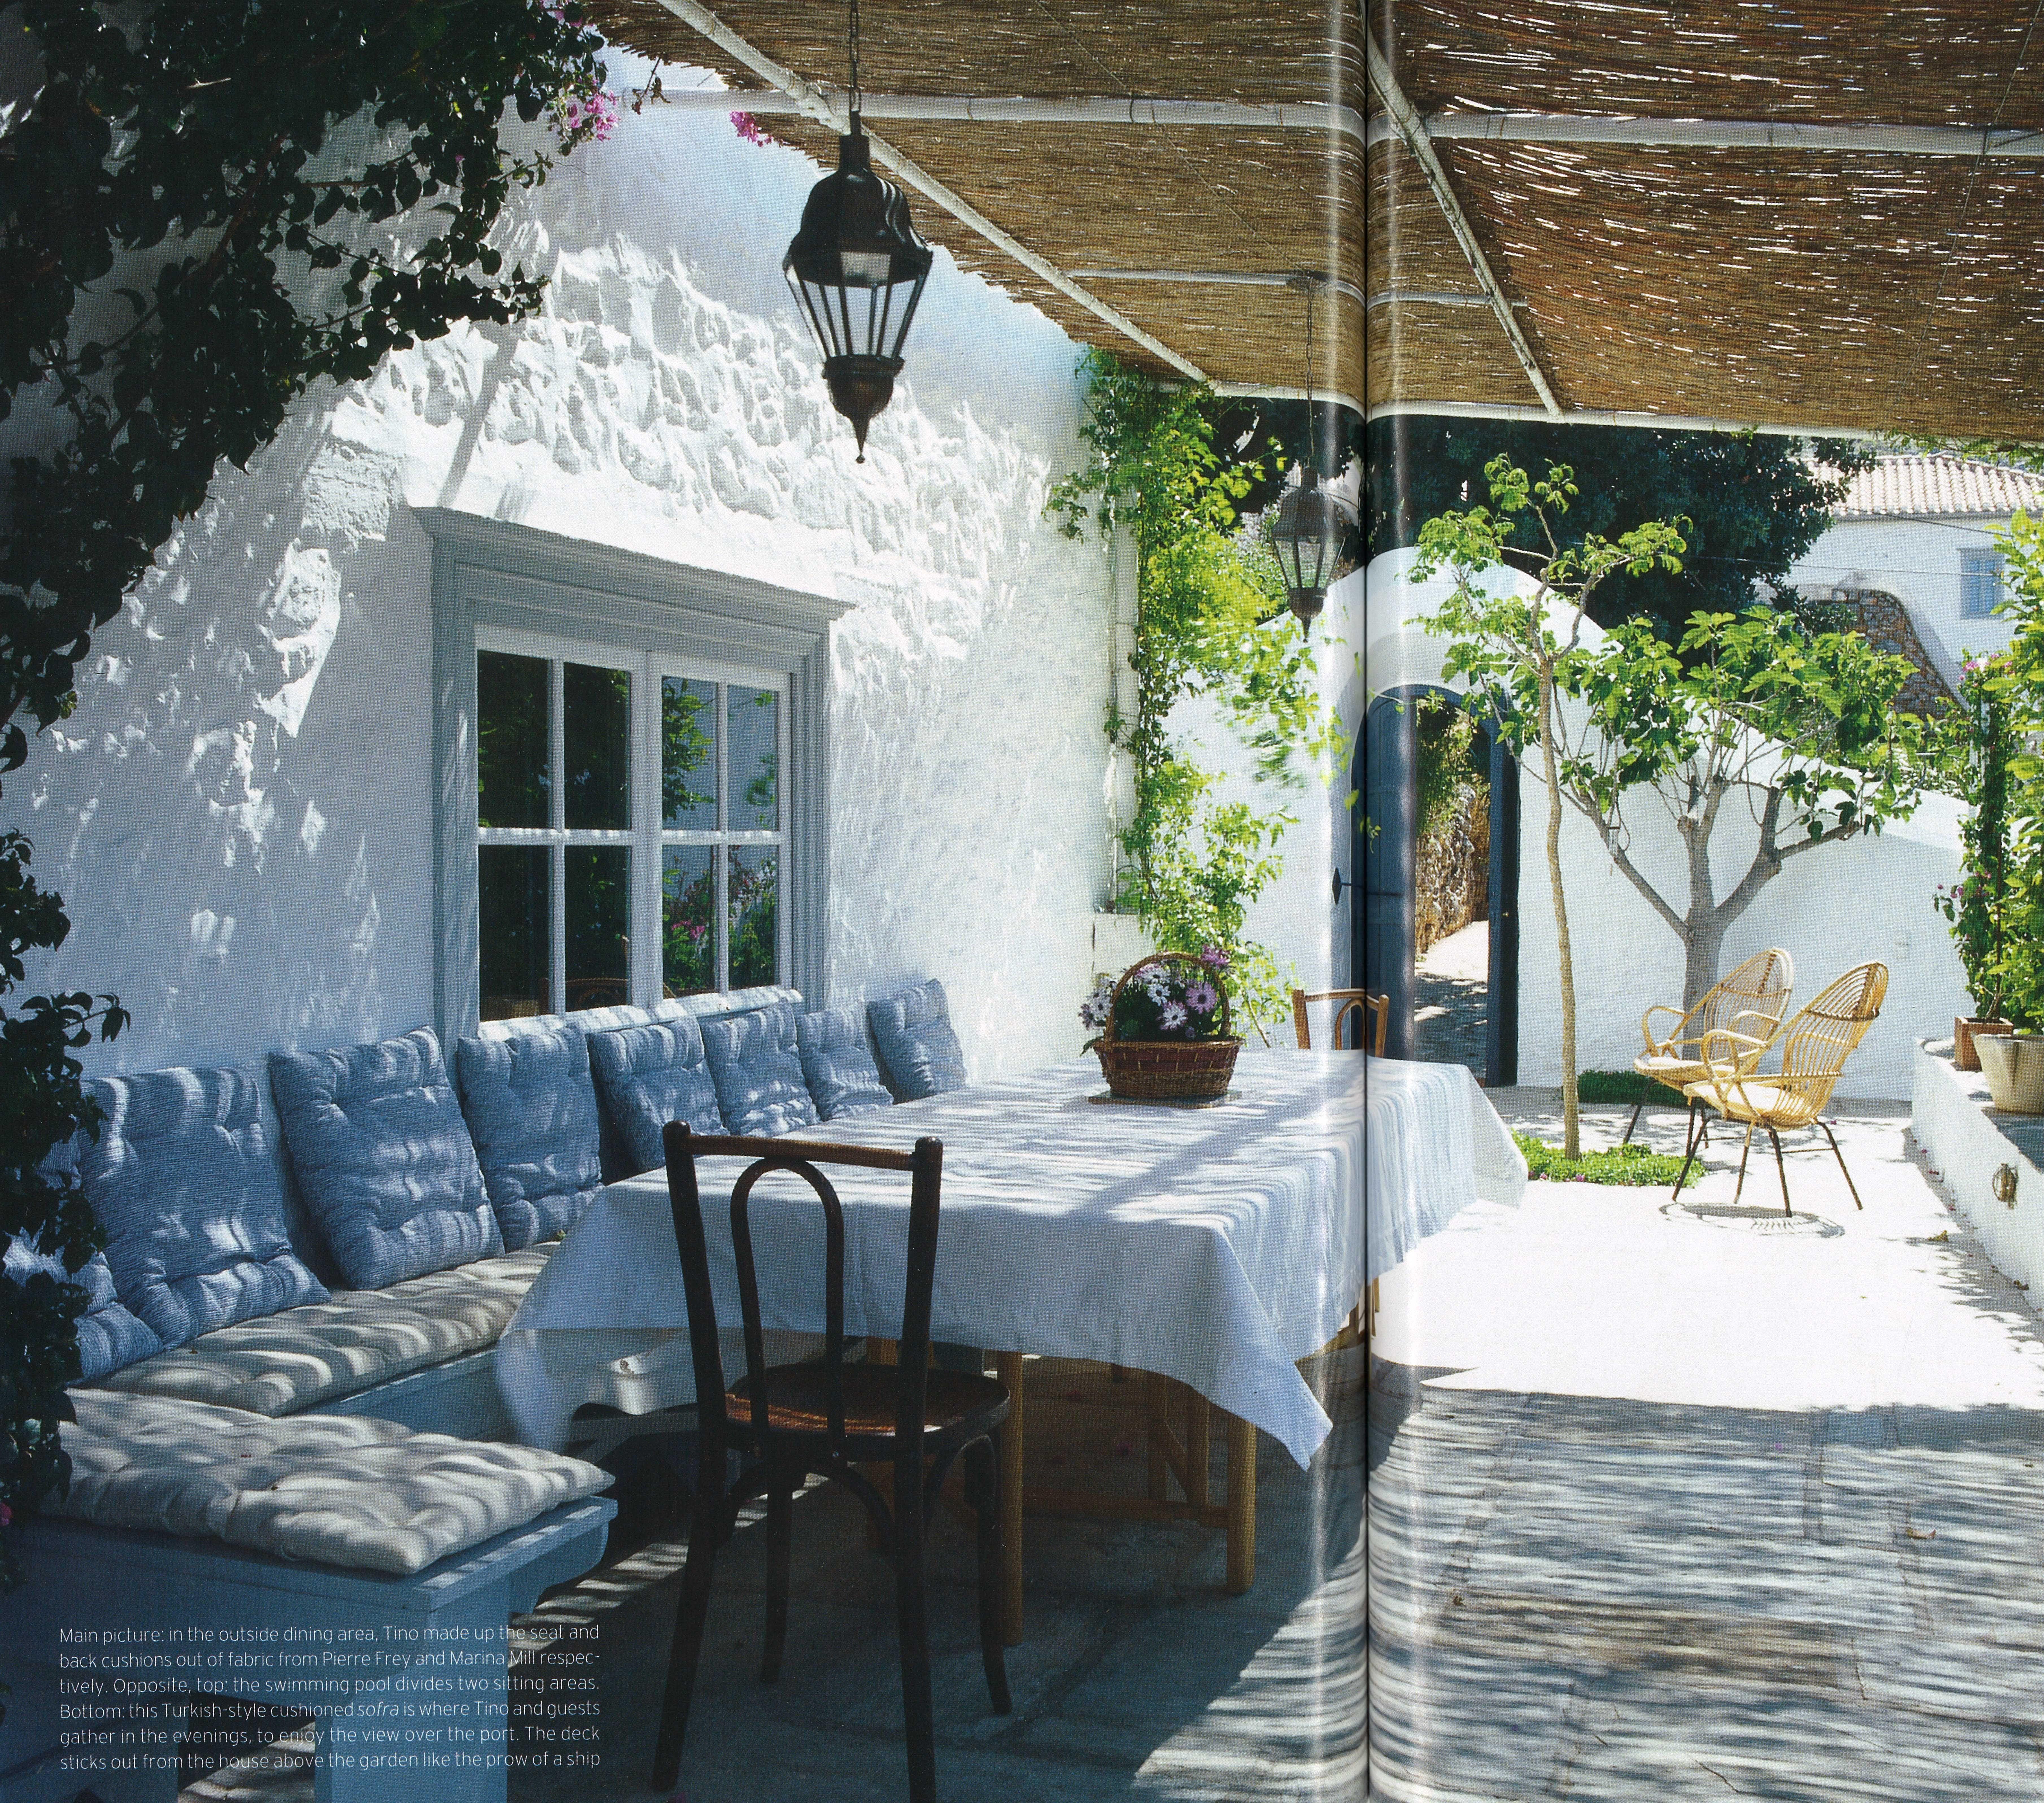 Tino Zervudachi Hydra House Terrace | Hydra | Pinterest | House ...